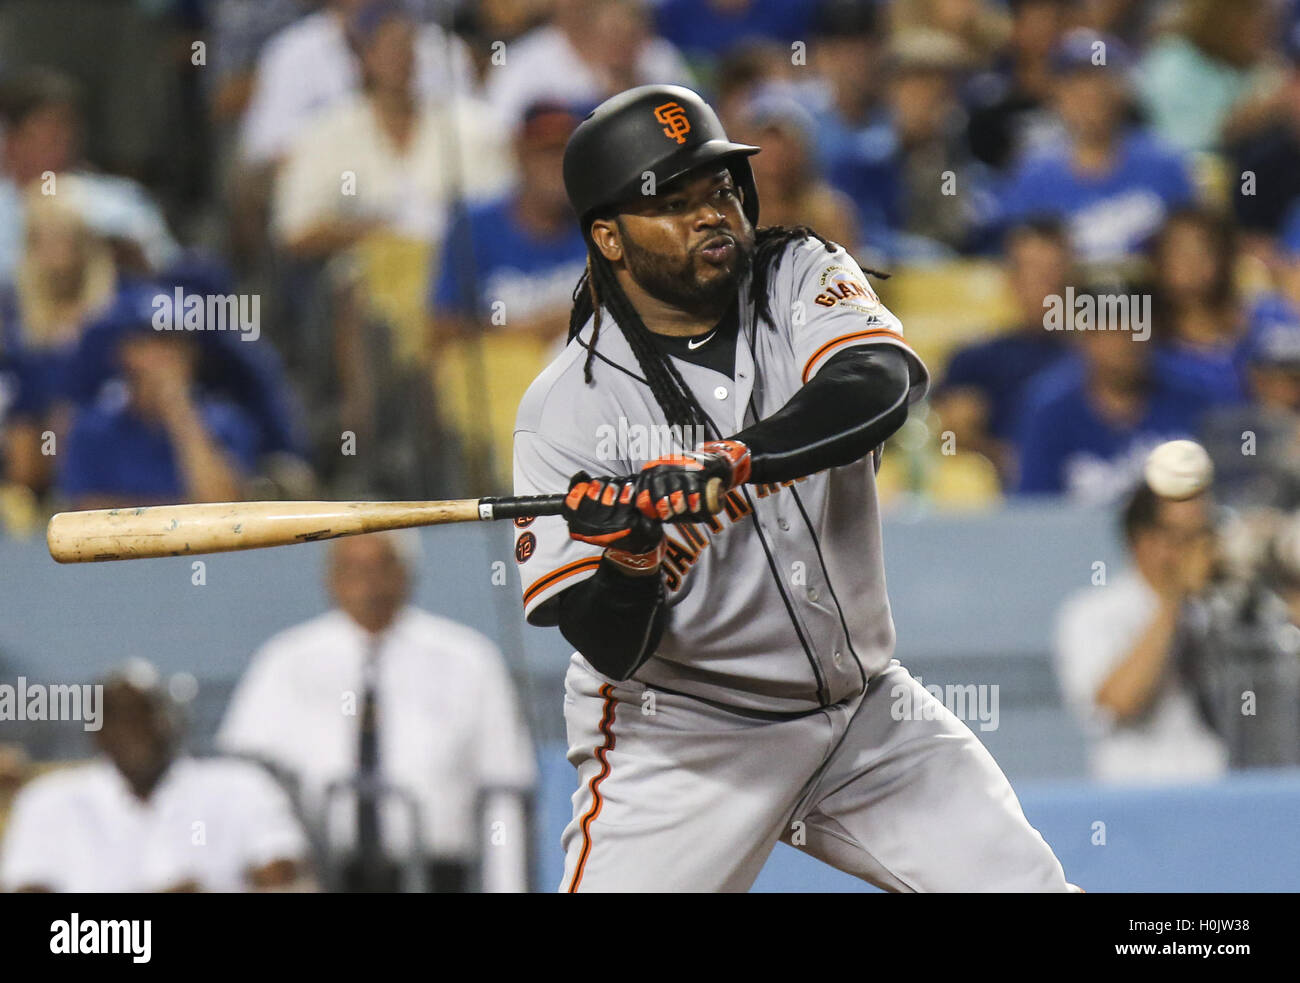 Los Angeles, Kalifornien, USA. 20. Sep, 2016. San Francisco Giants Catcher Johnny Cueto schlägt den Ball gegen Stockbild